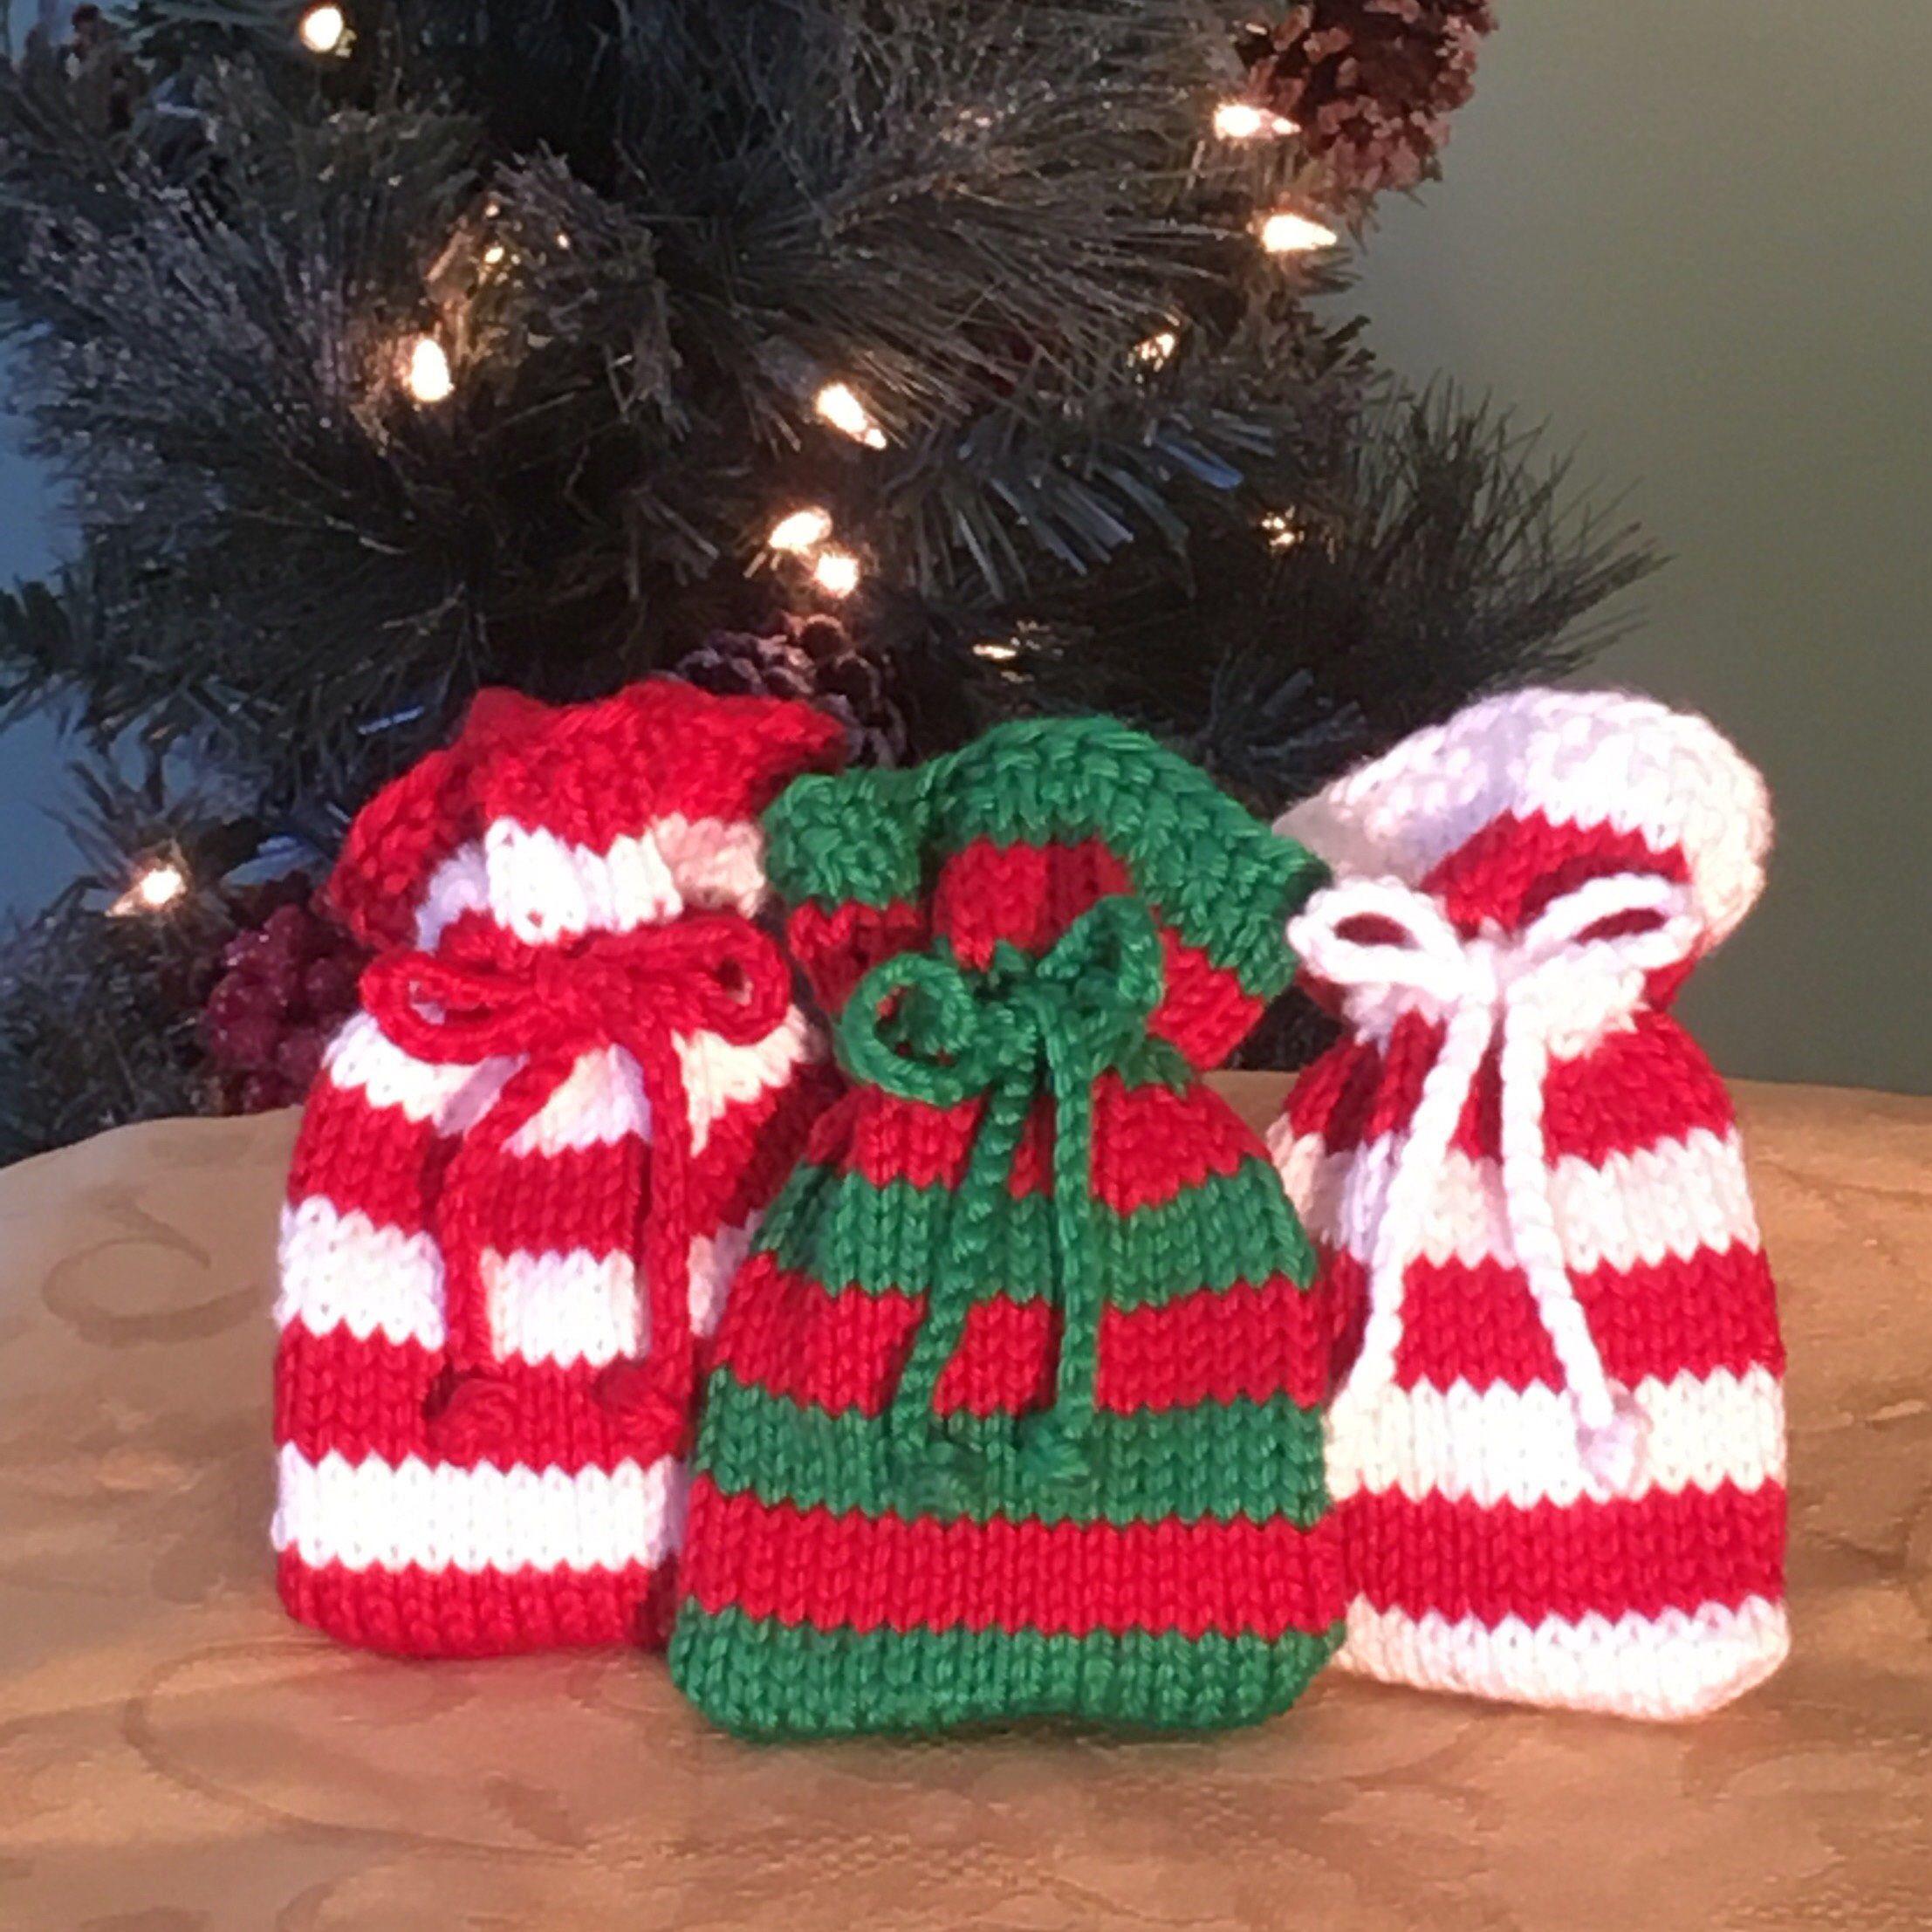 Stocking Stuffer Red White And Green Knit Sachet Gift Bag Jewelry Case Trinket B Christmas Crochet Patterns Christmas Knitting Patterns Christmas Knitting